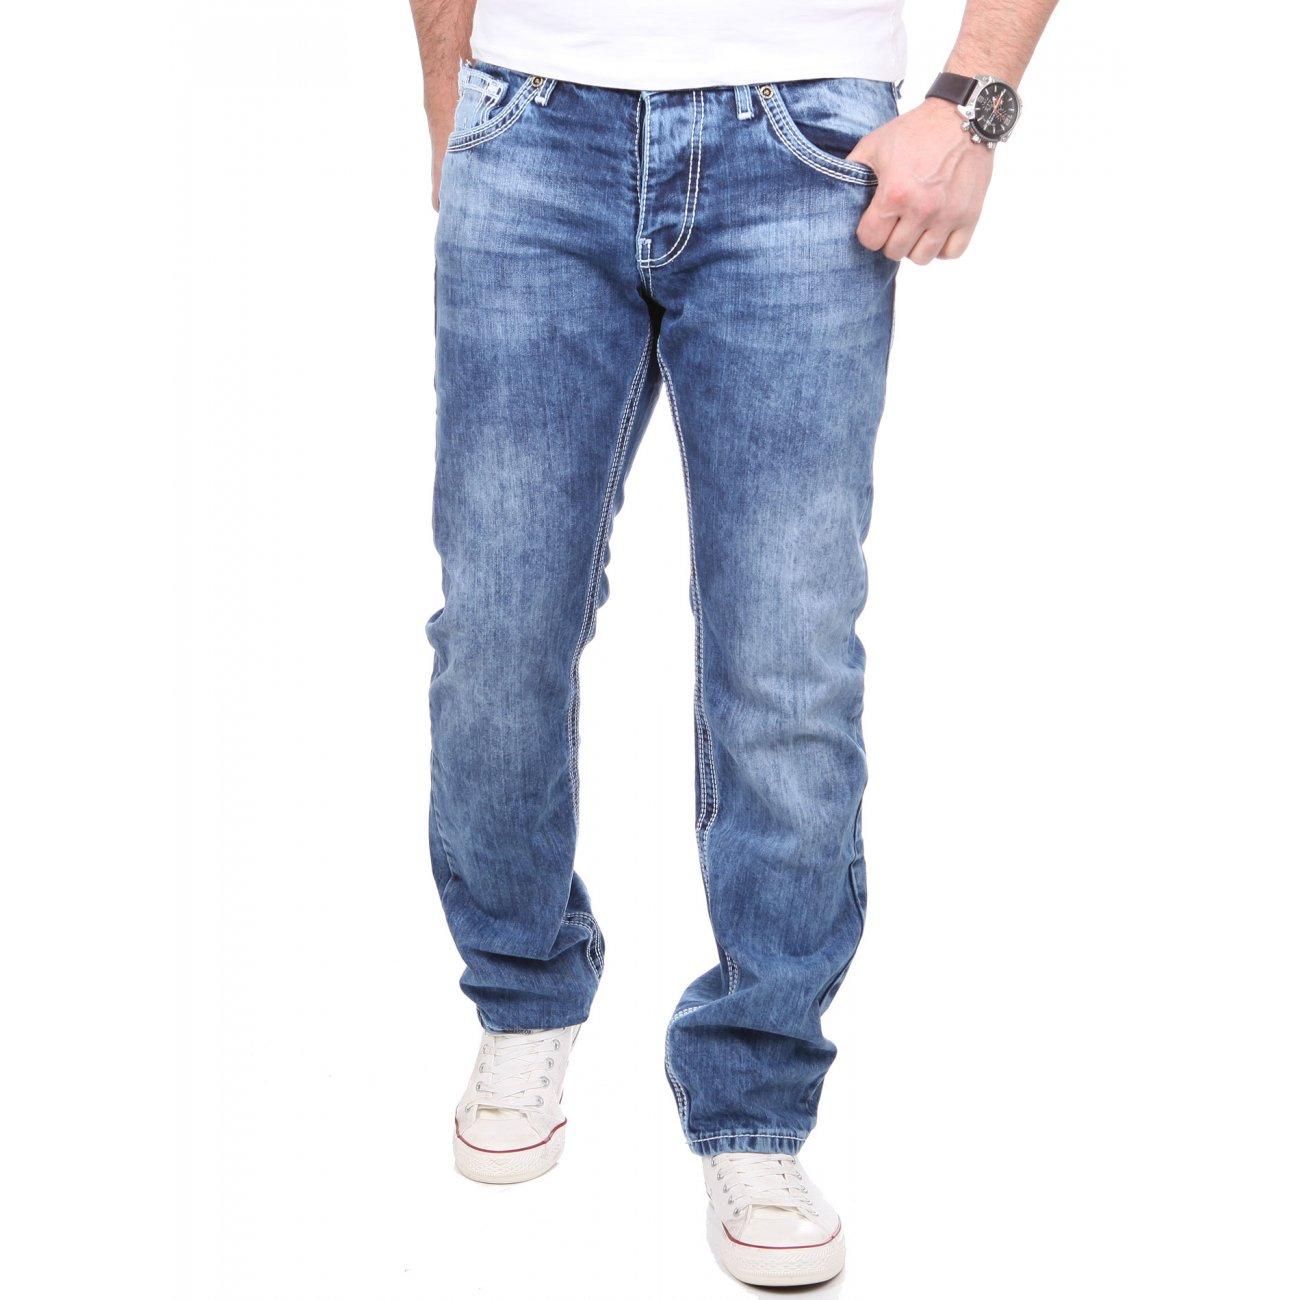 herren jeans used style mit dicker naht 9574 g nstig kaufen. Black Bedroom Furniture Sets. Home Design Ideas